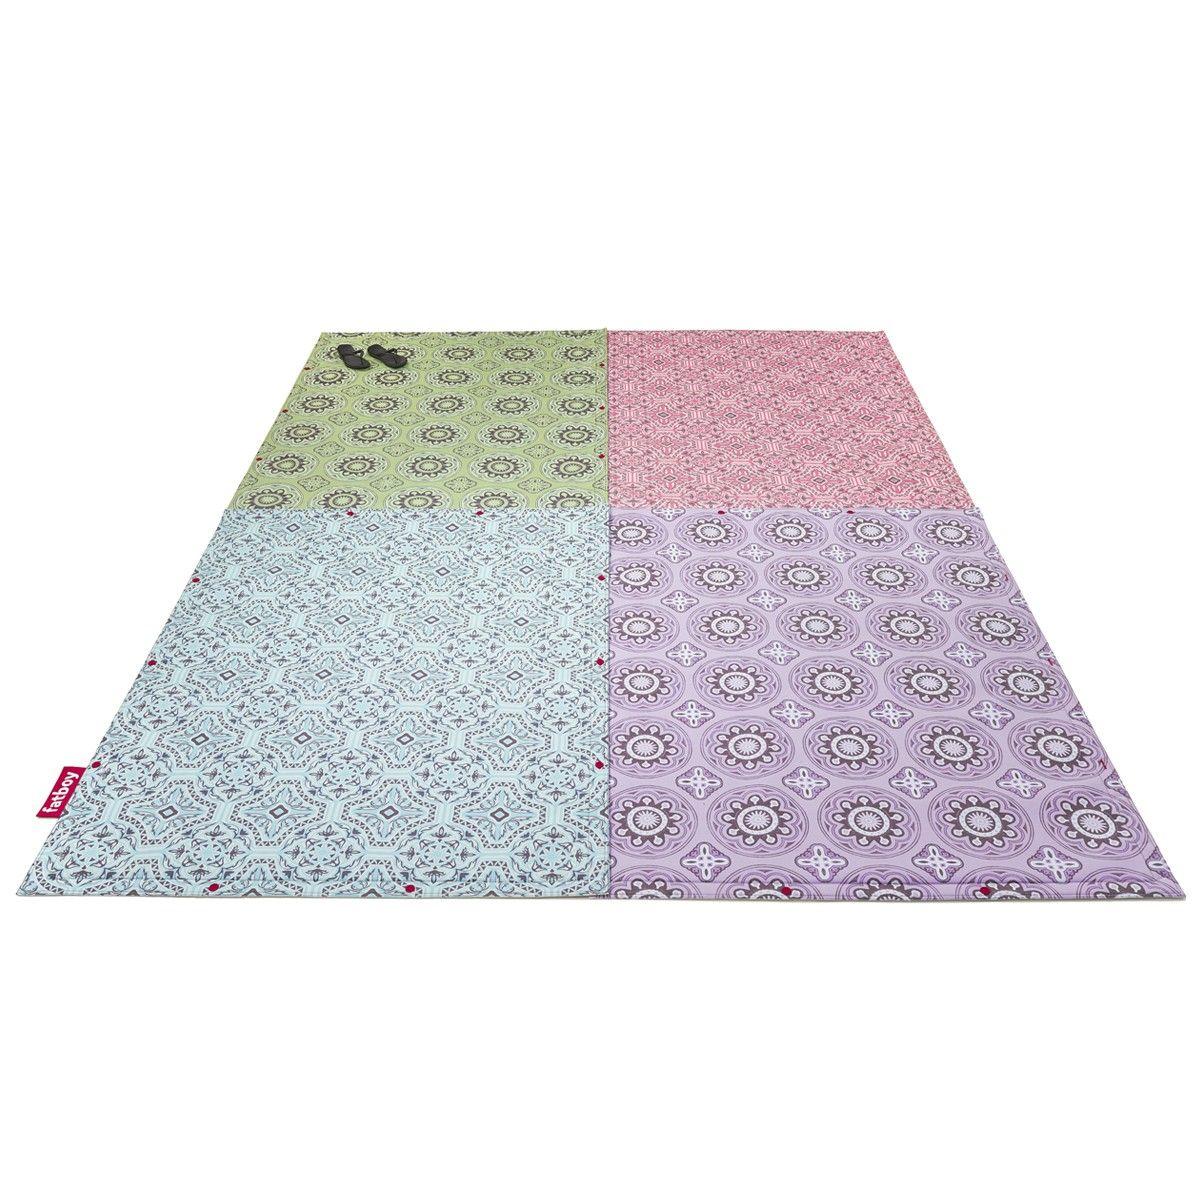 Flying Carpet   Tapis (Non ) Flying Carpets   Online Shop | Fatboy